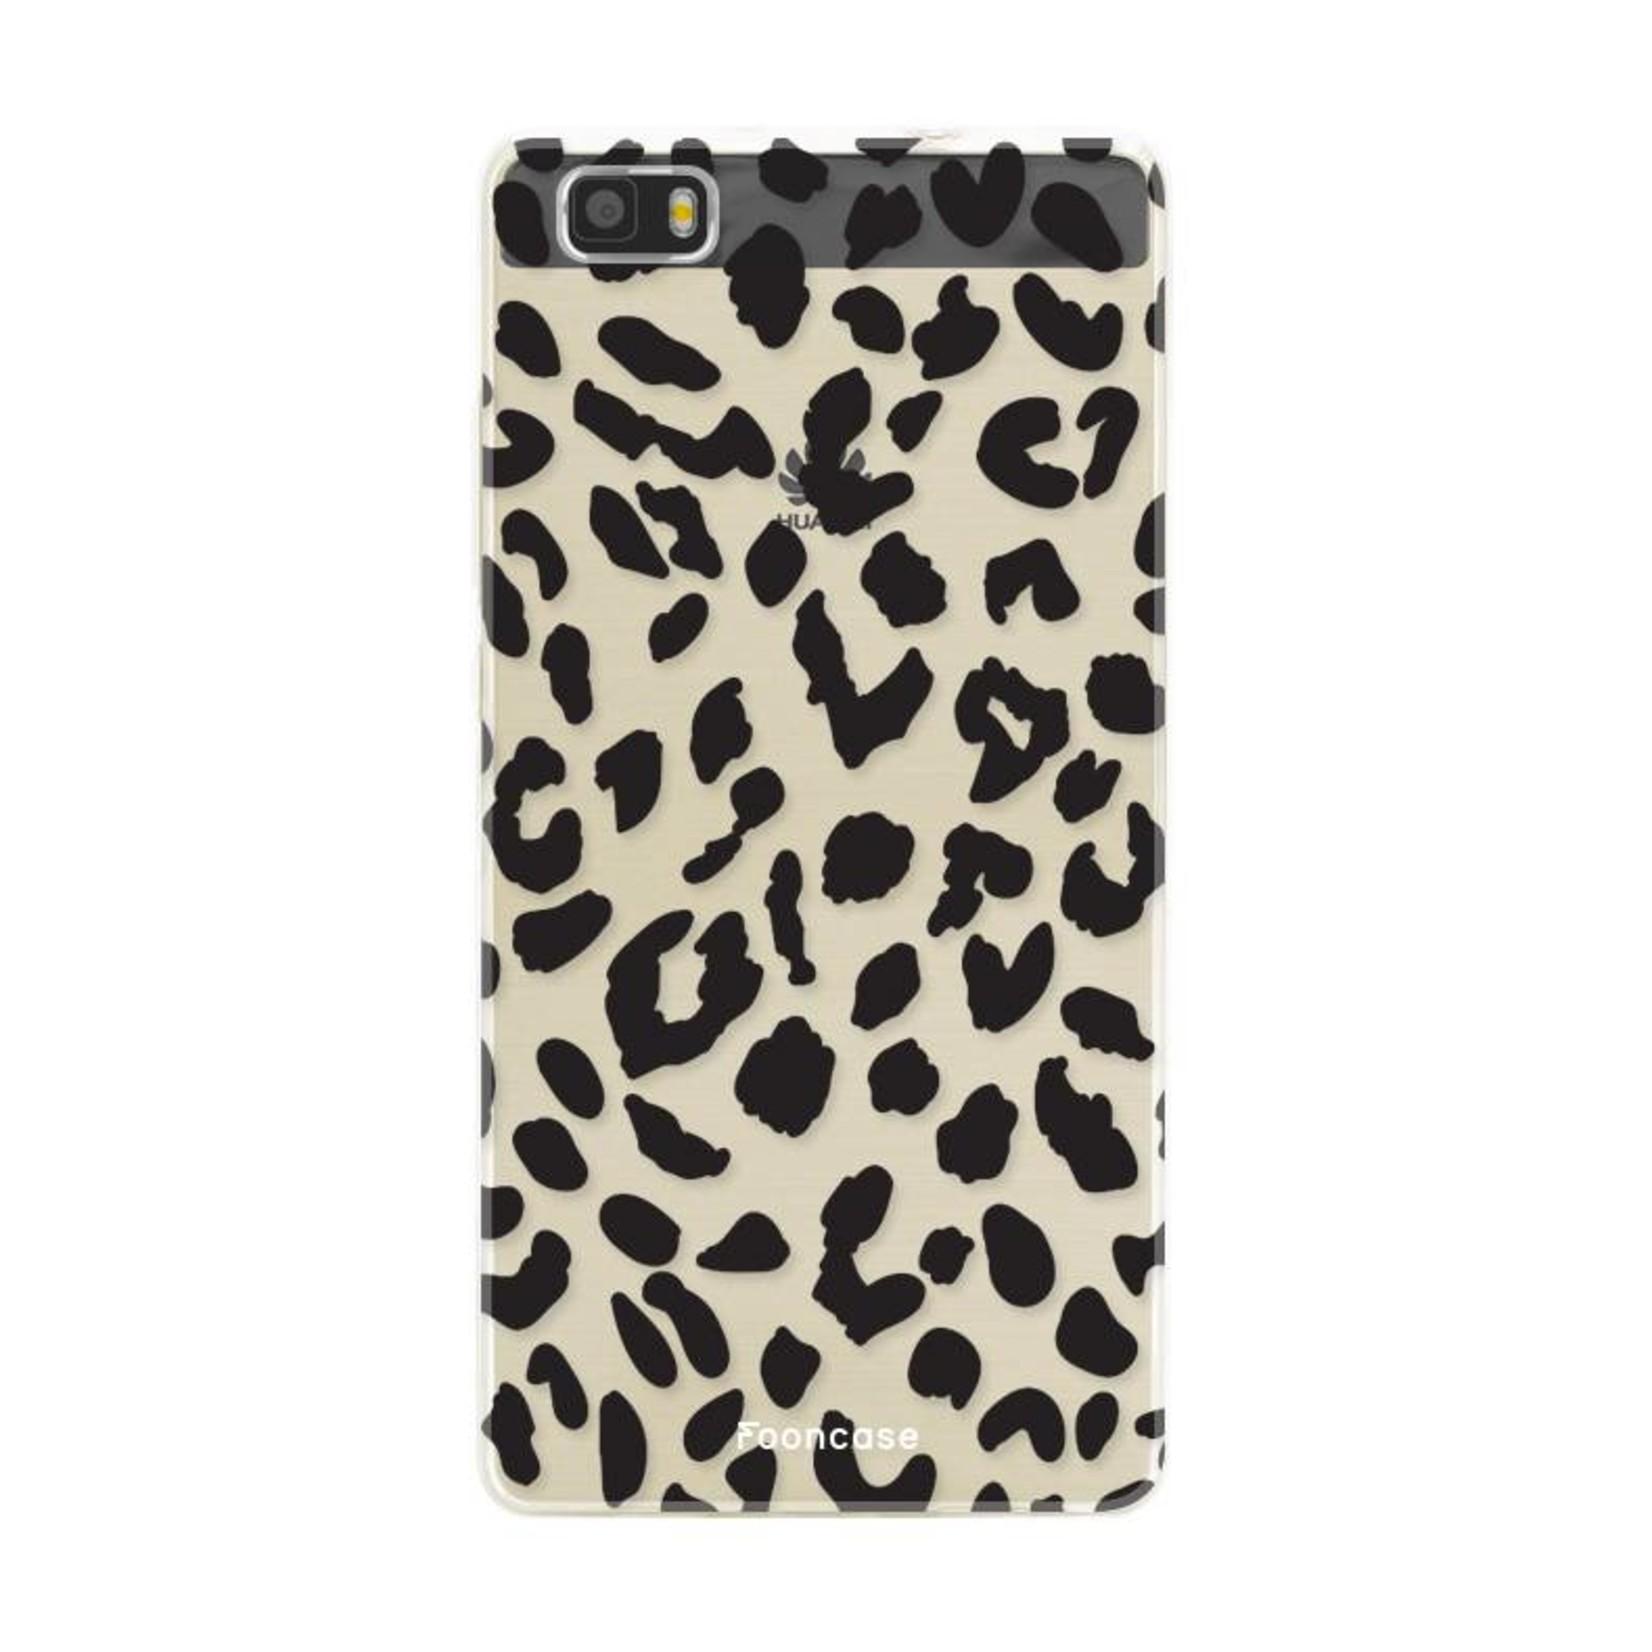 FOONCASE Huawei P8 Lite 2016 Handyhülle - Leopard